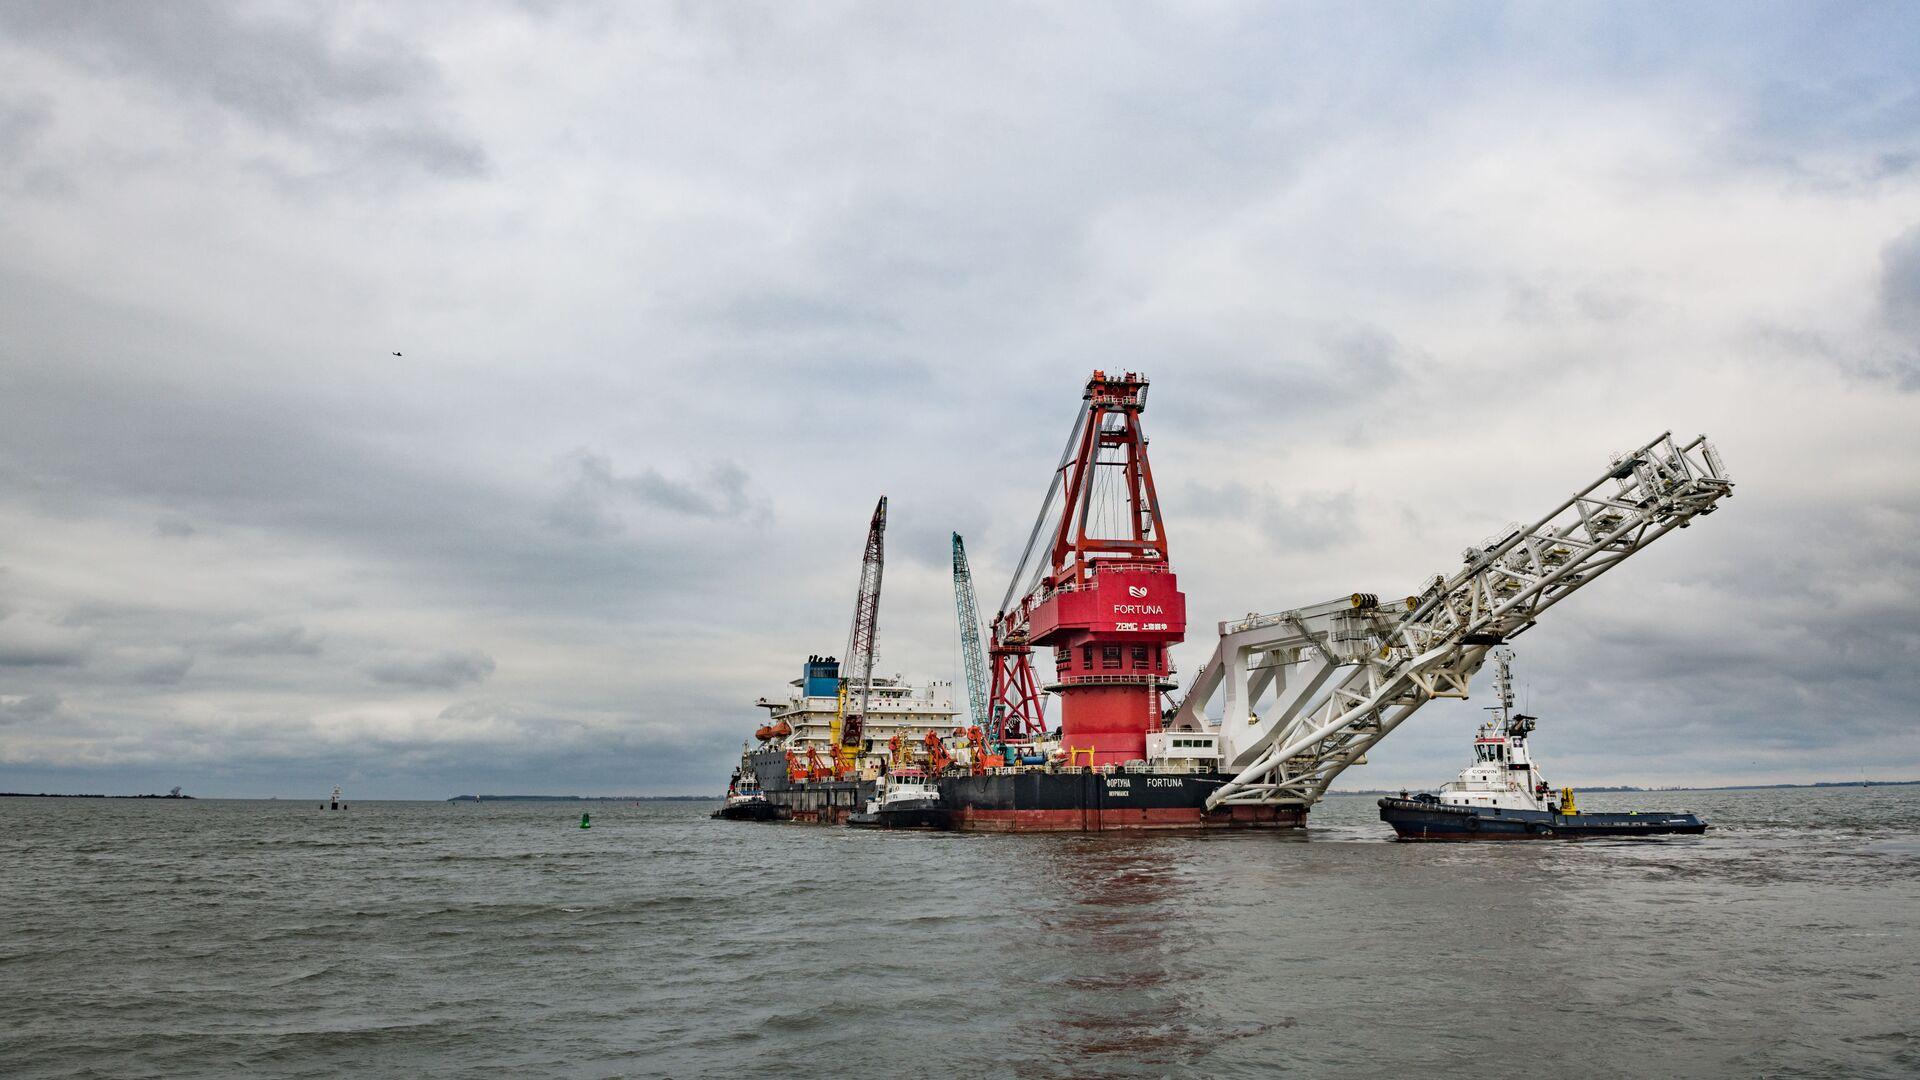 Pipe-laying vessel Fortuna leaves the port of Wismar - Sputnik International, 1920, 09.03.2021